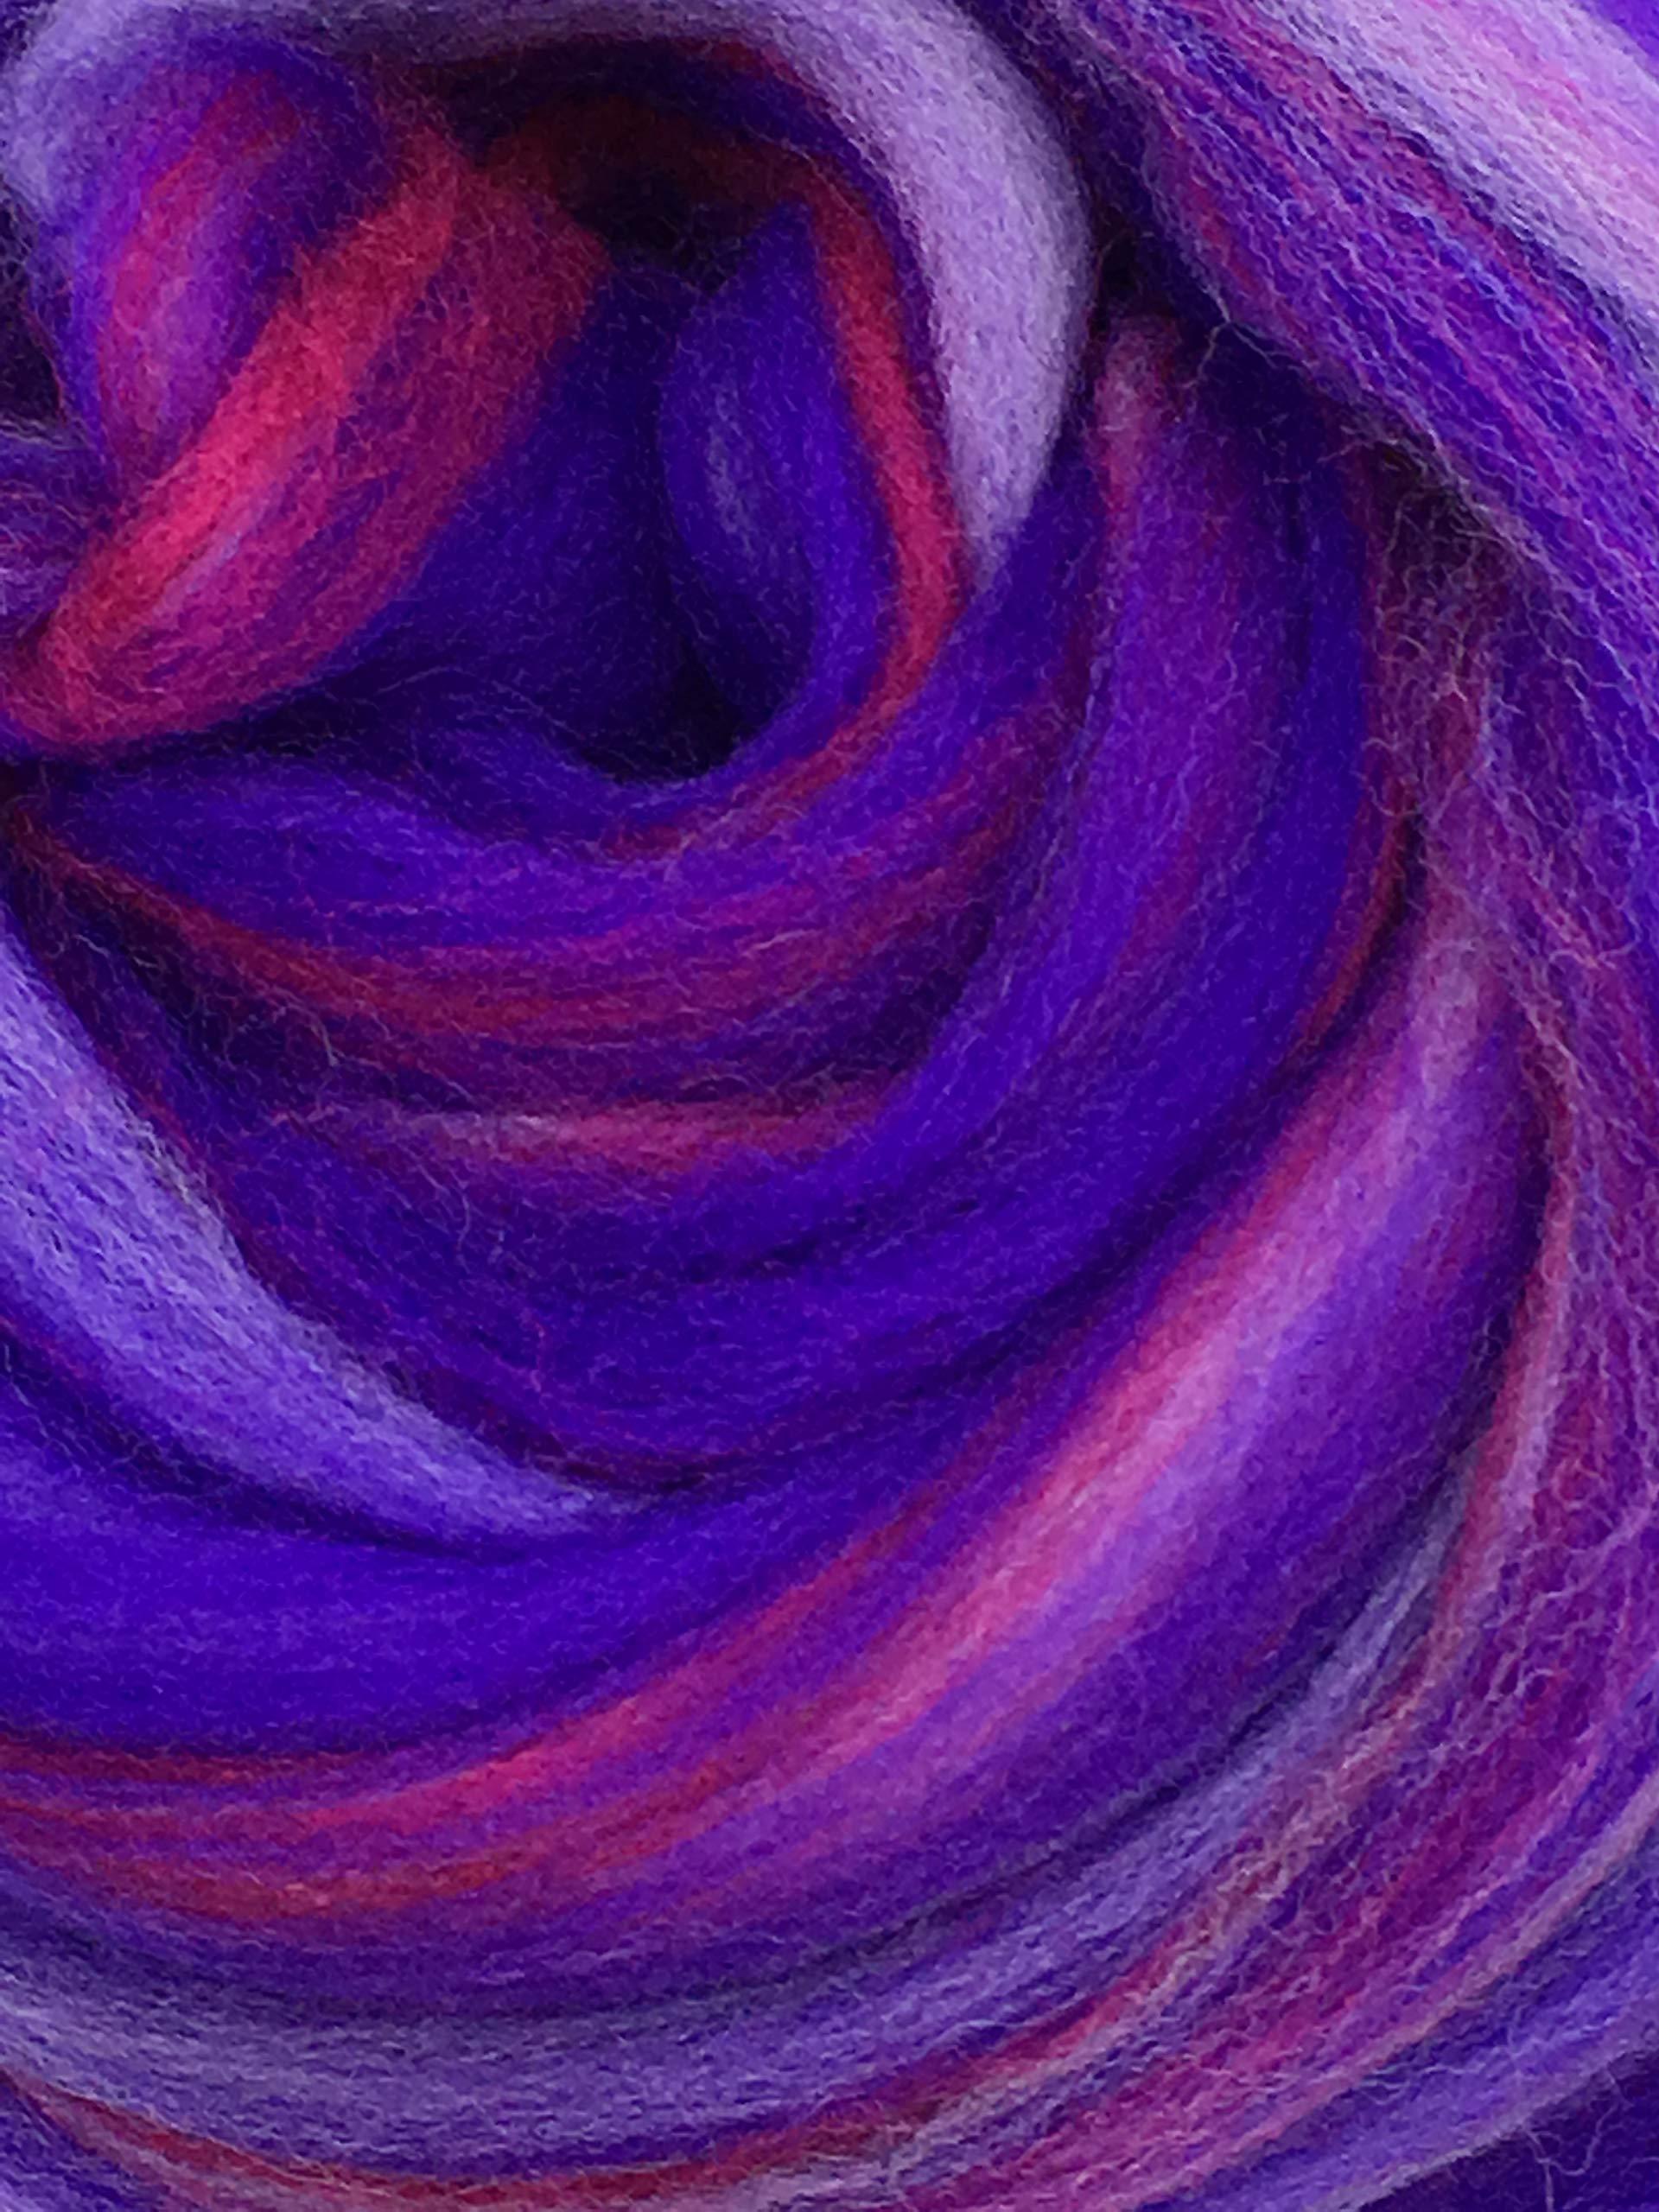 Shep's Wild Berry Merino Wool Top Roving Fiber Spinning, Felting Crafts USA (4lb)